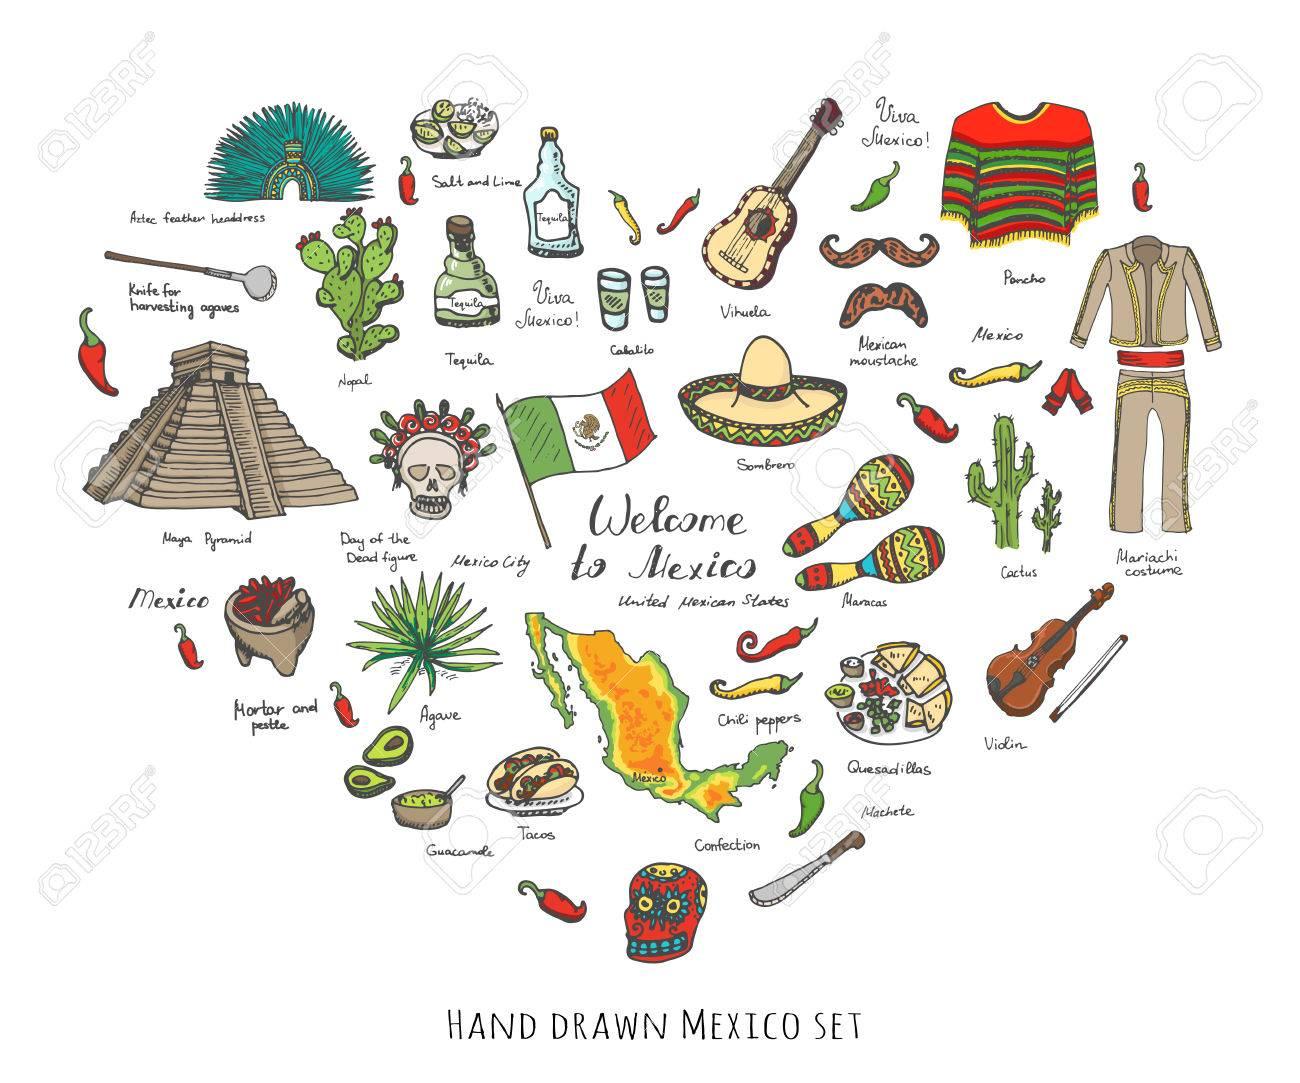 Dibujado A Mano Doodle De México Establece Ilustración Vectorial Sketchy  Iconos De Comida Mexicana Estados Unidos Mexicanos Elementos De La Bandera  De ... c05e1fe67e5